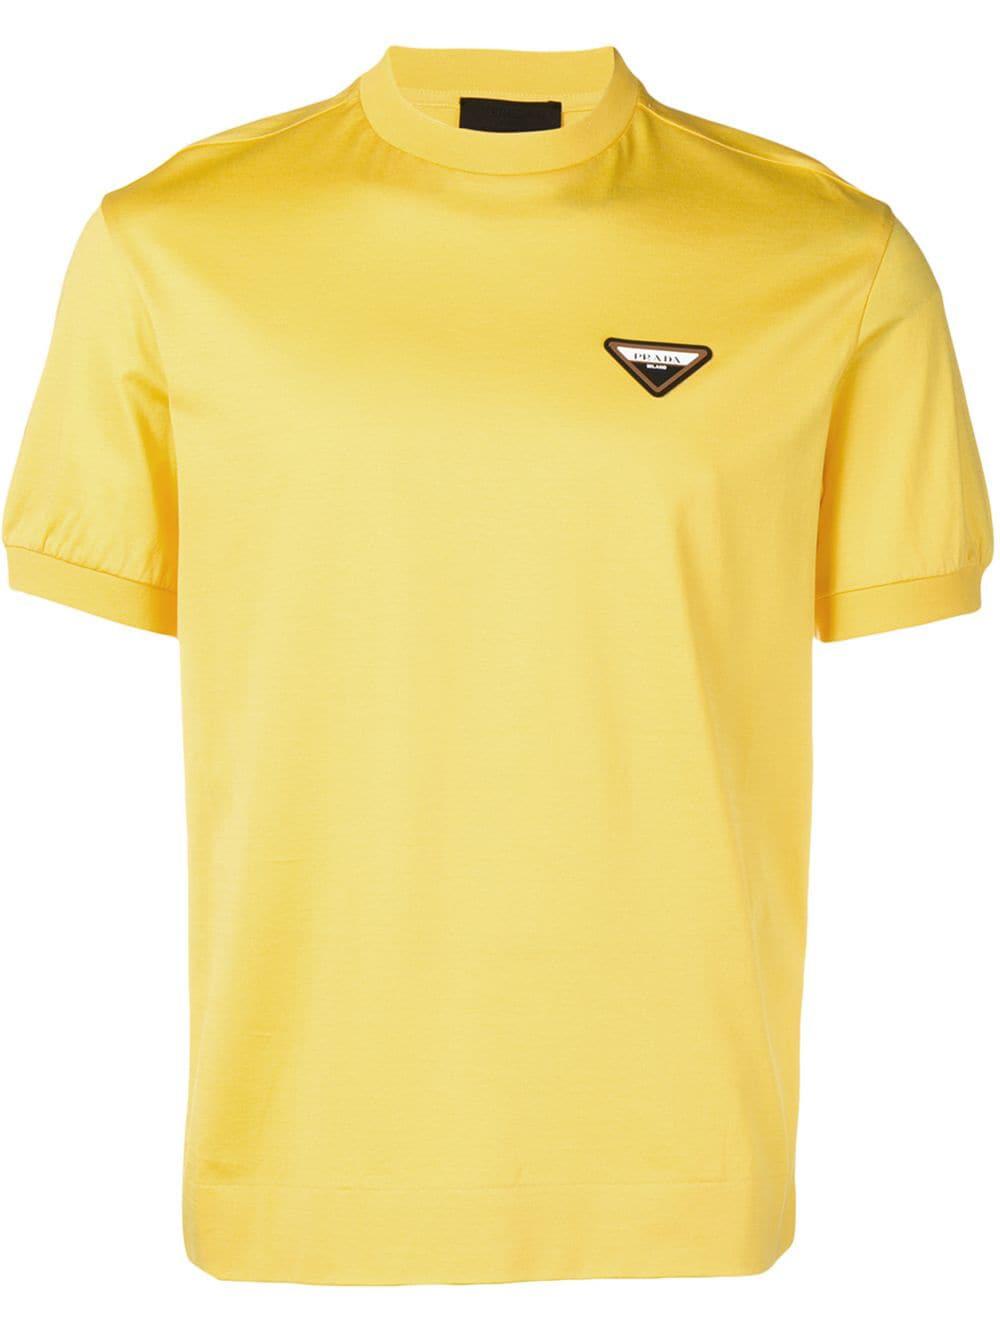 434a0fd06250a Prada T-Shirt Mit Logo-Patch - Gelb In Yellow